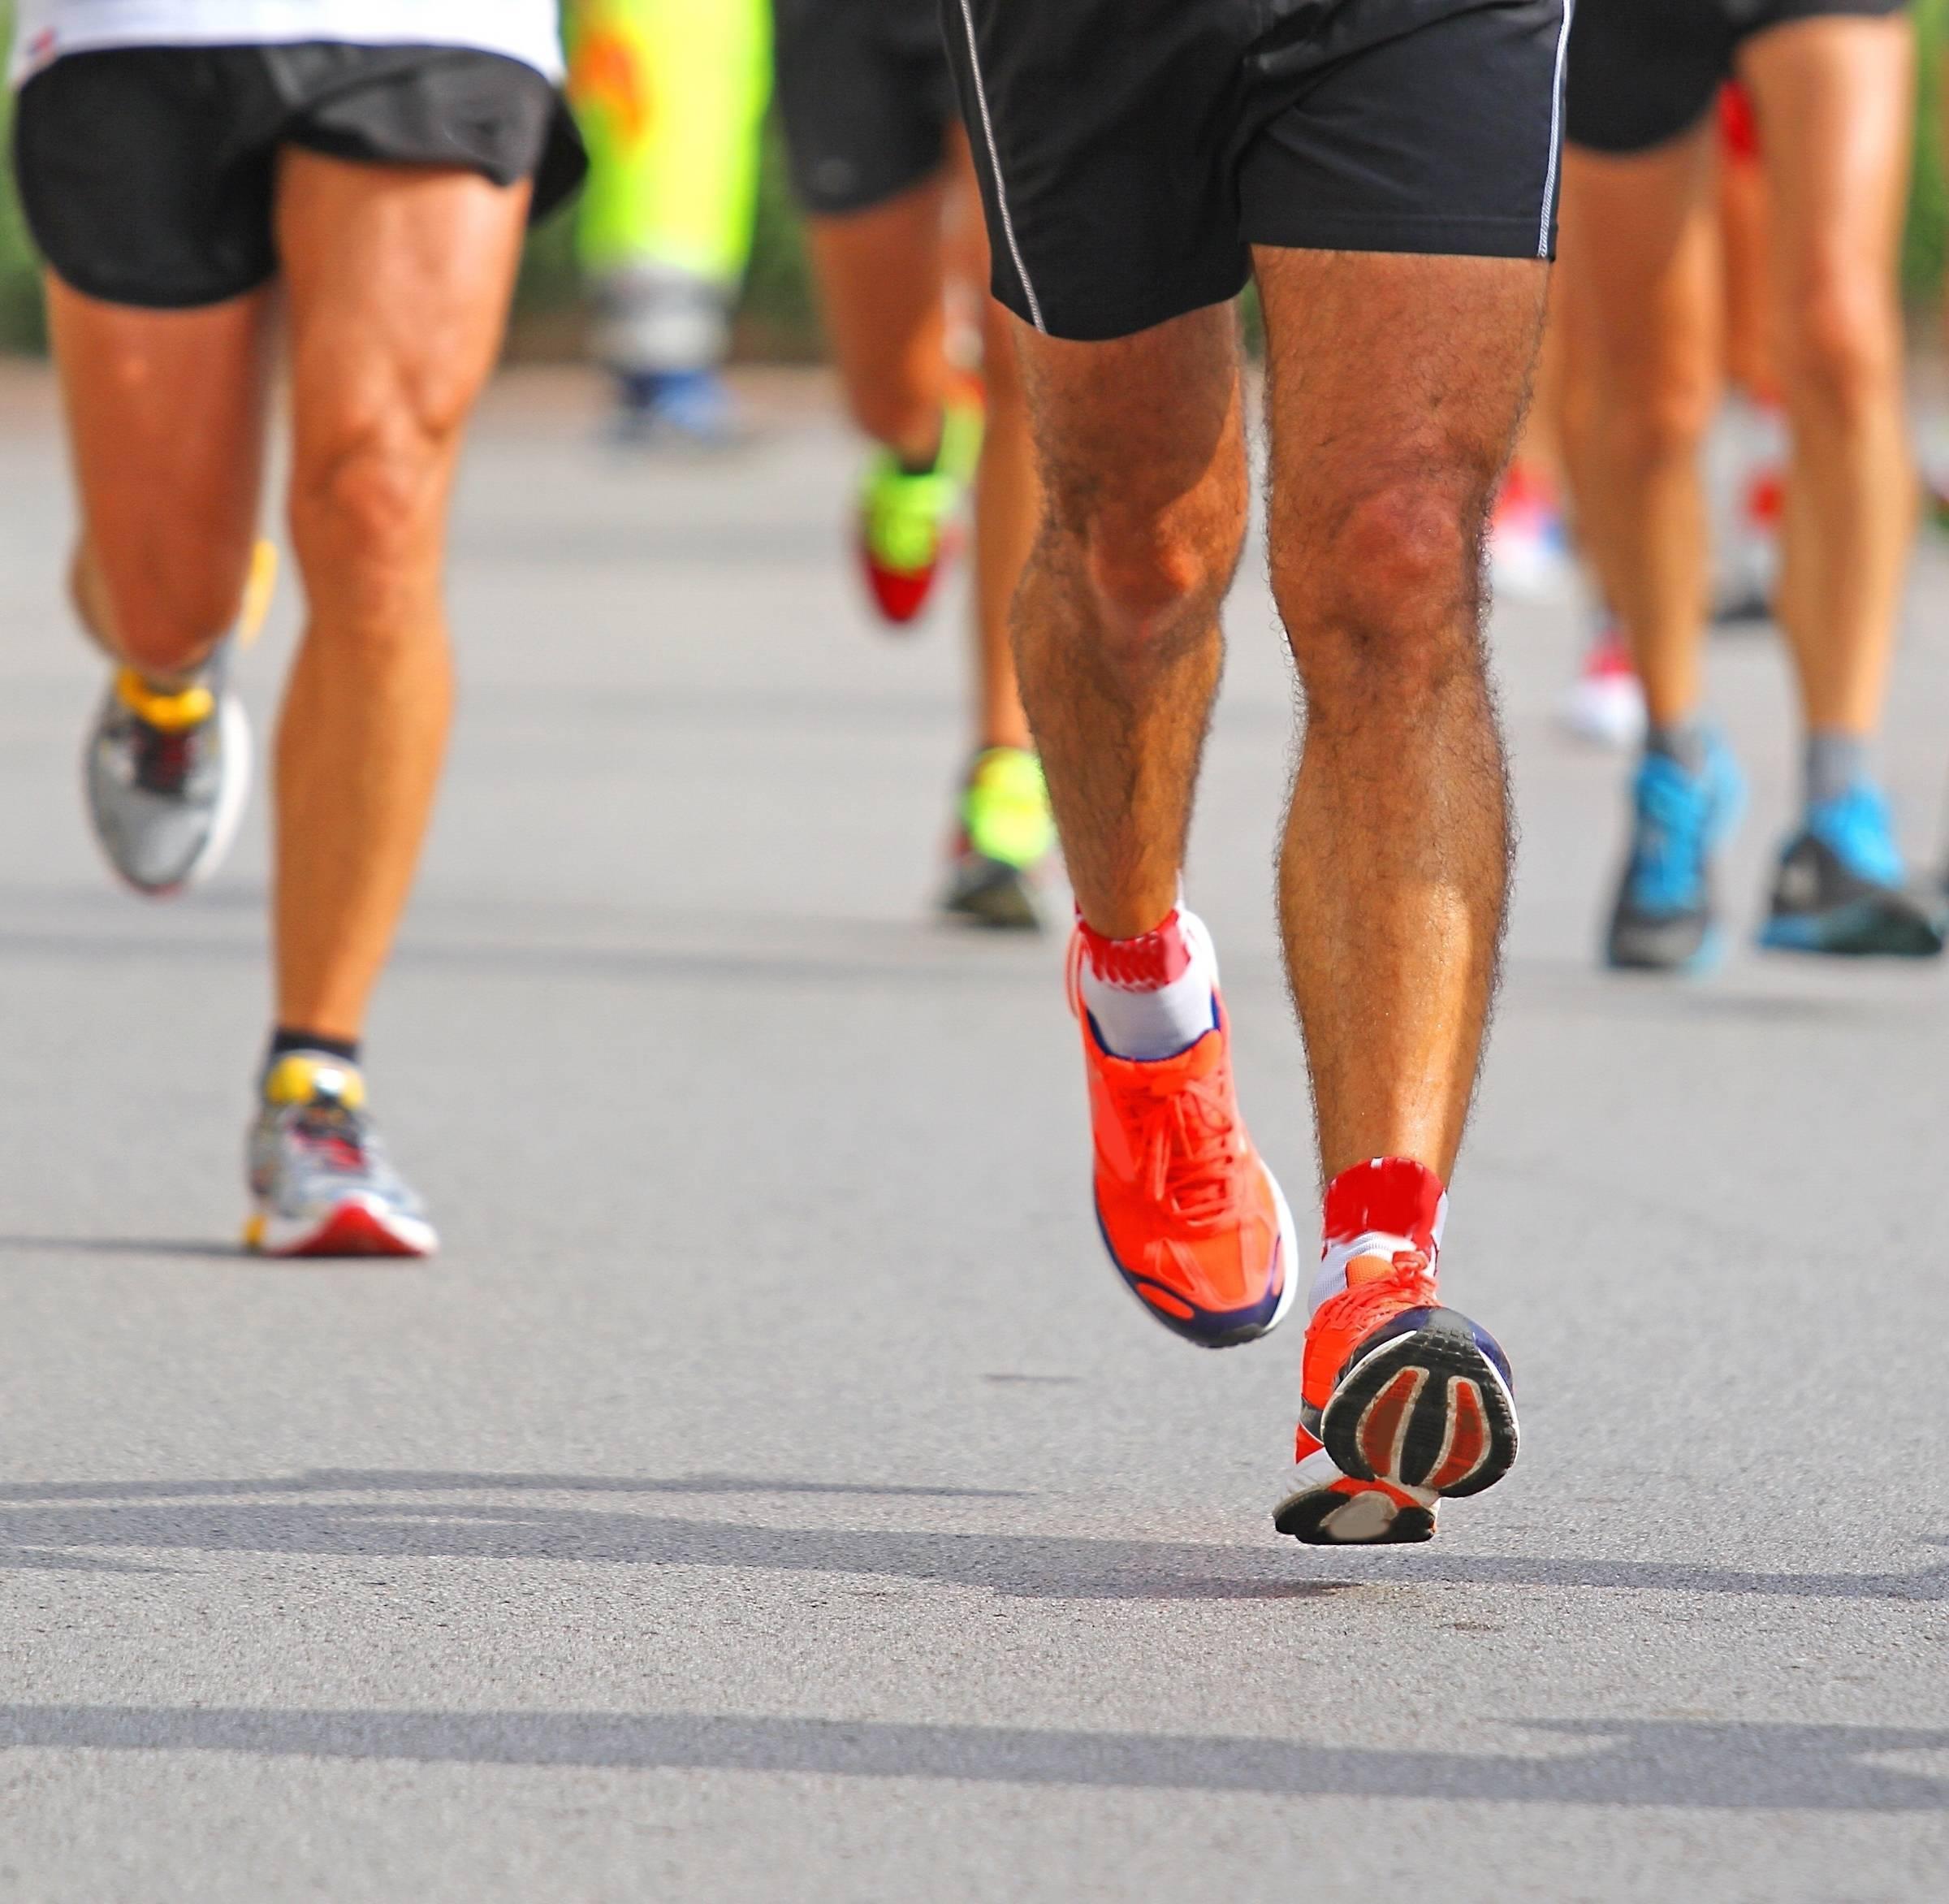 Police Advisory: Morris Knolls 5K Run, Sat April 13, 8:30am